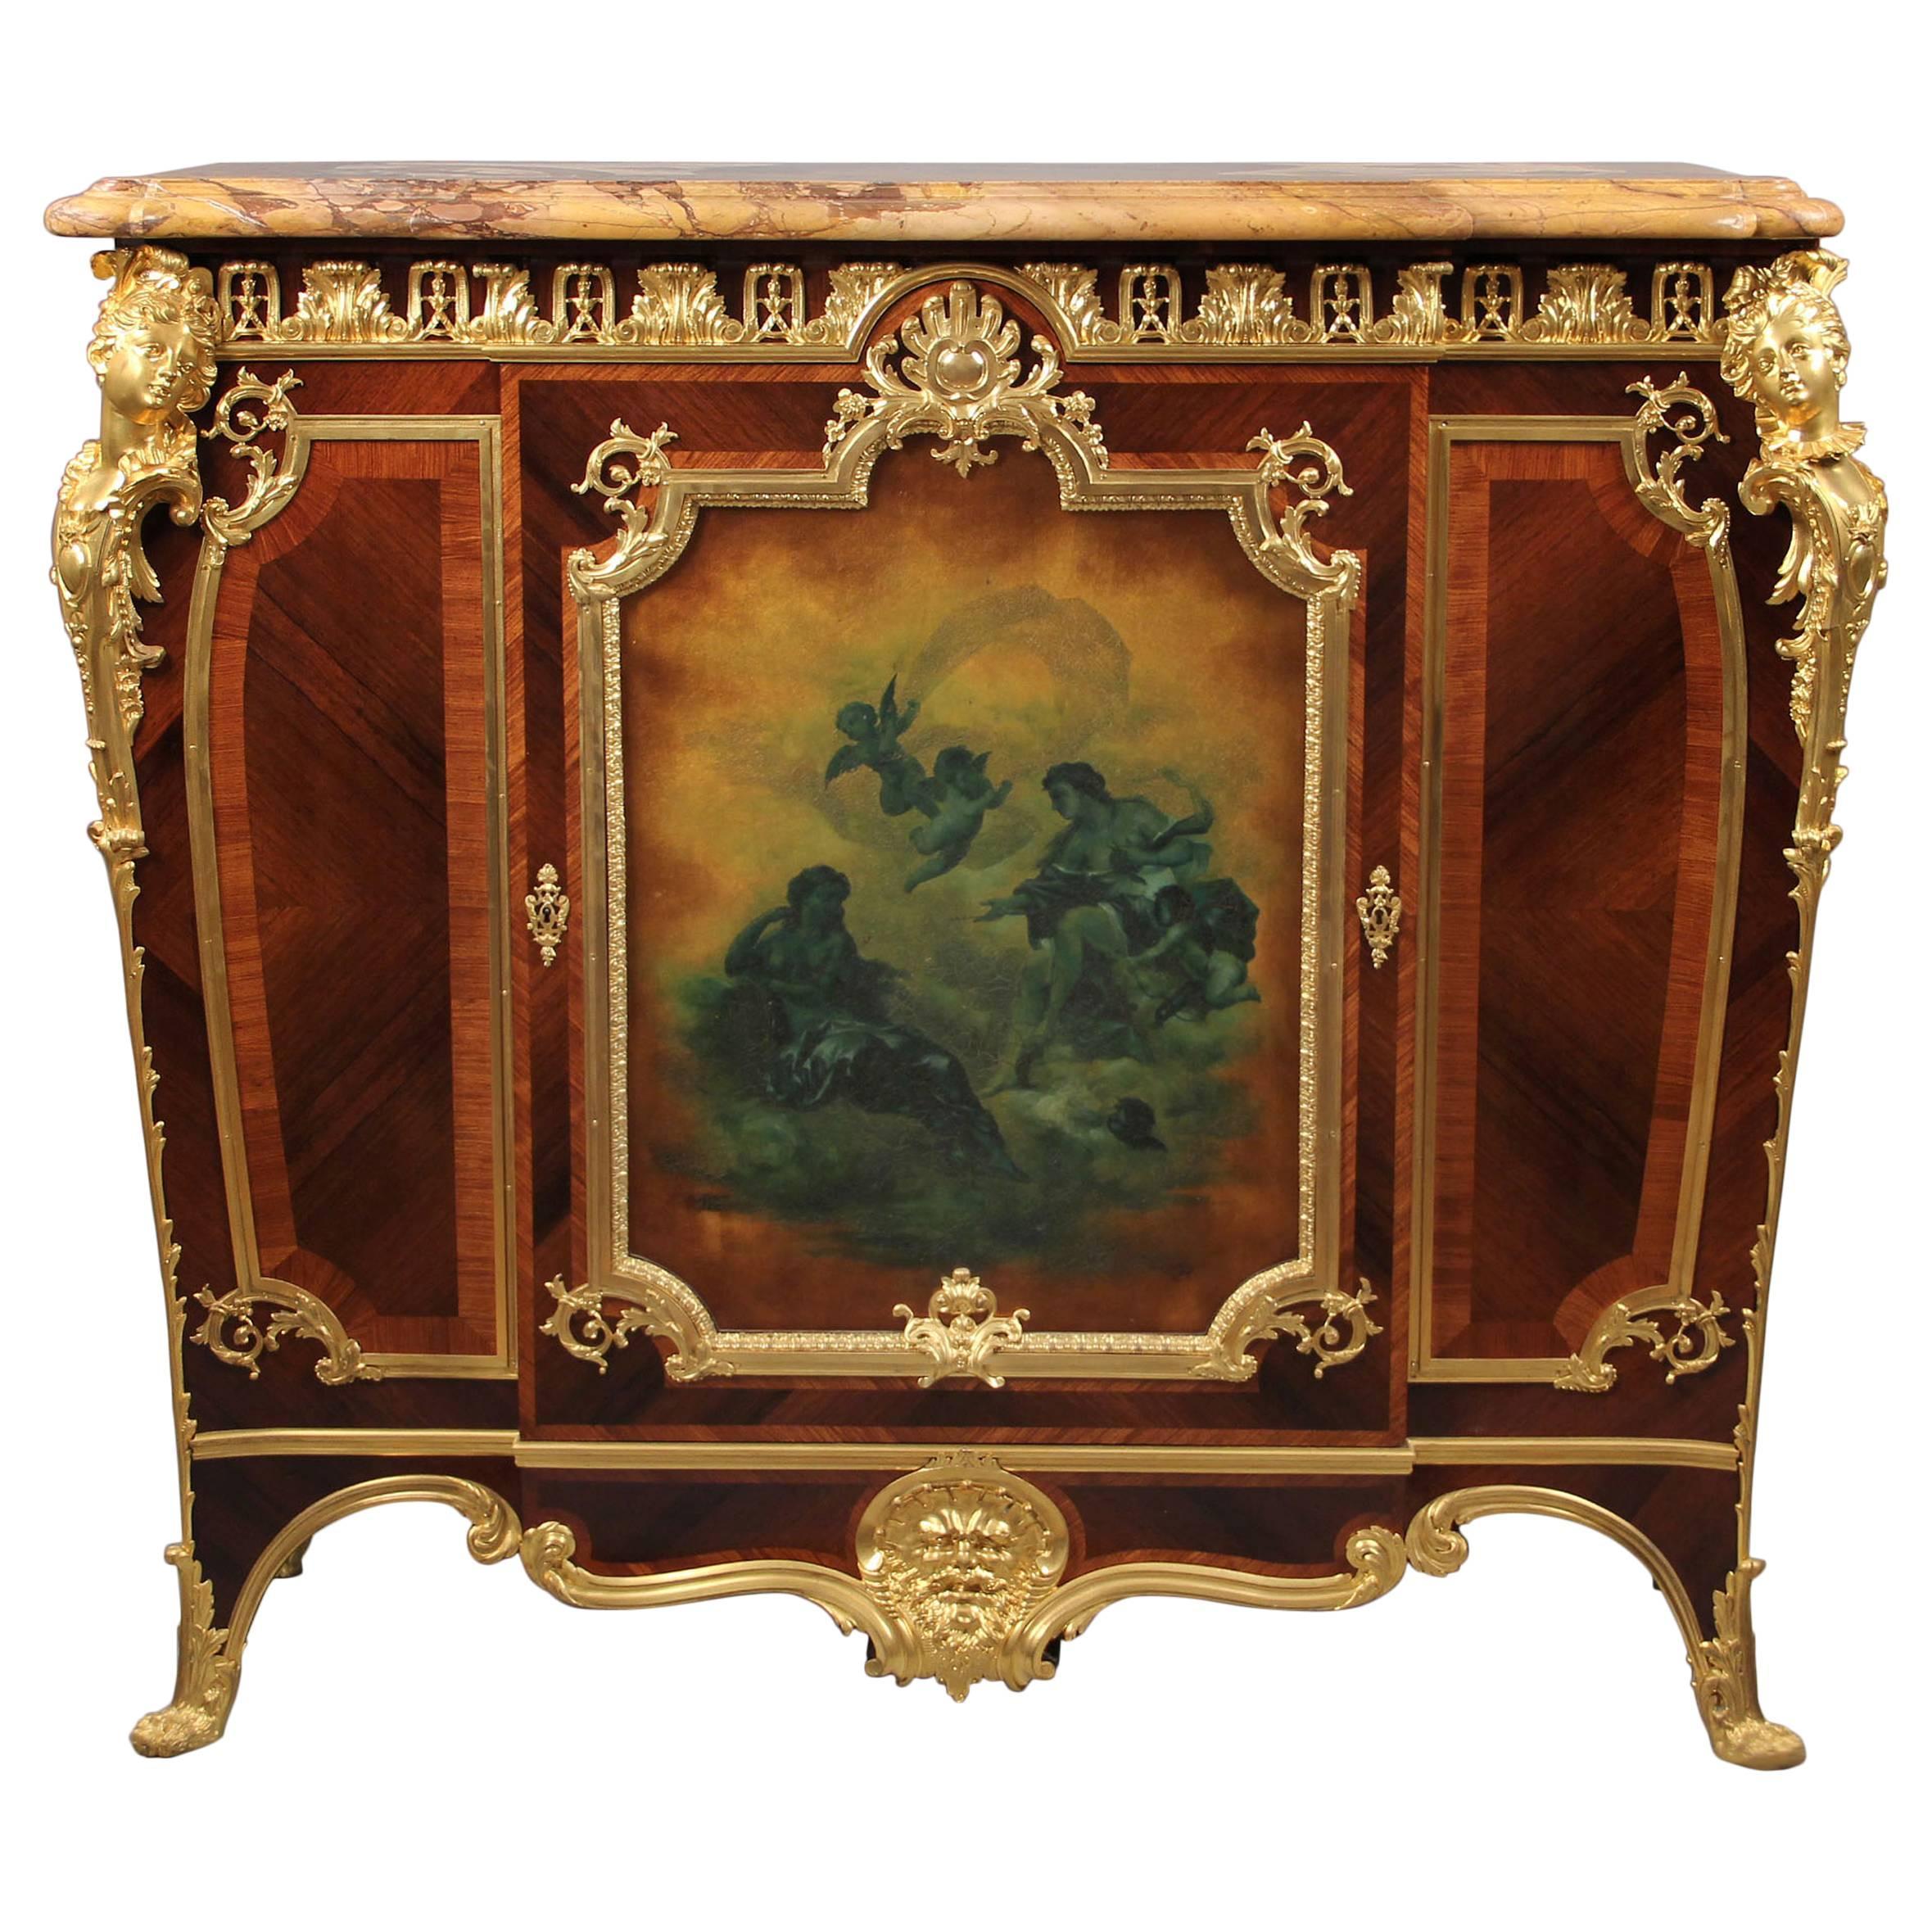 Fine 19th Century Gilt Bronze-Mounted Cabinet by Joseph Zwiener